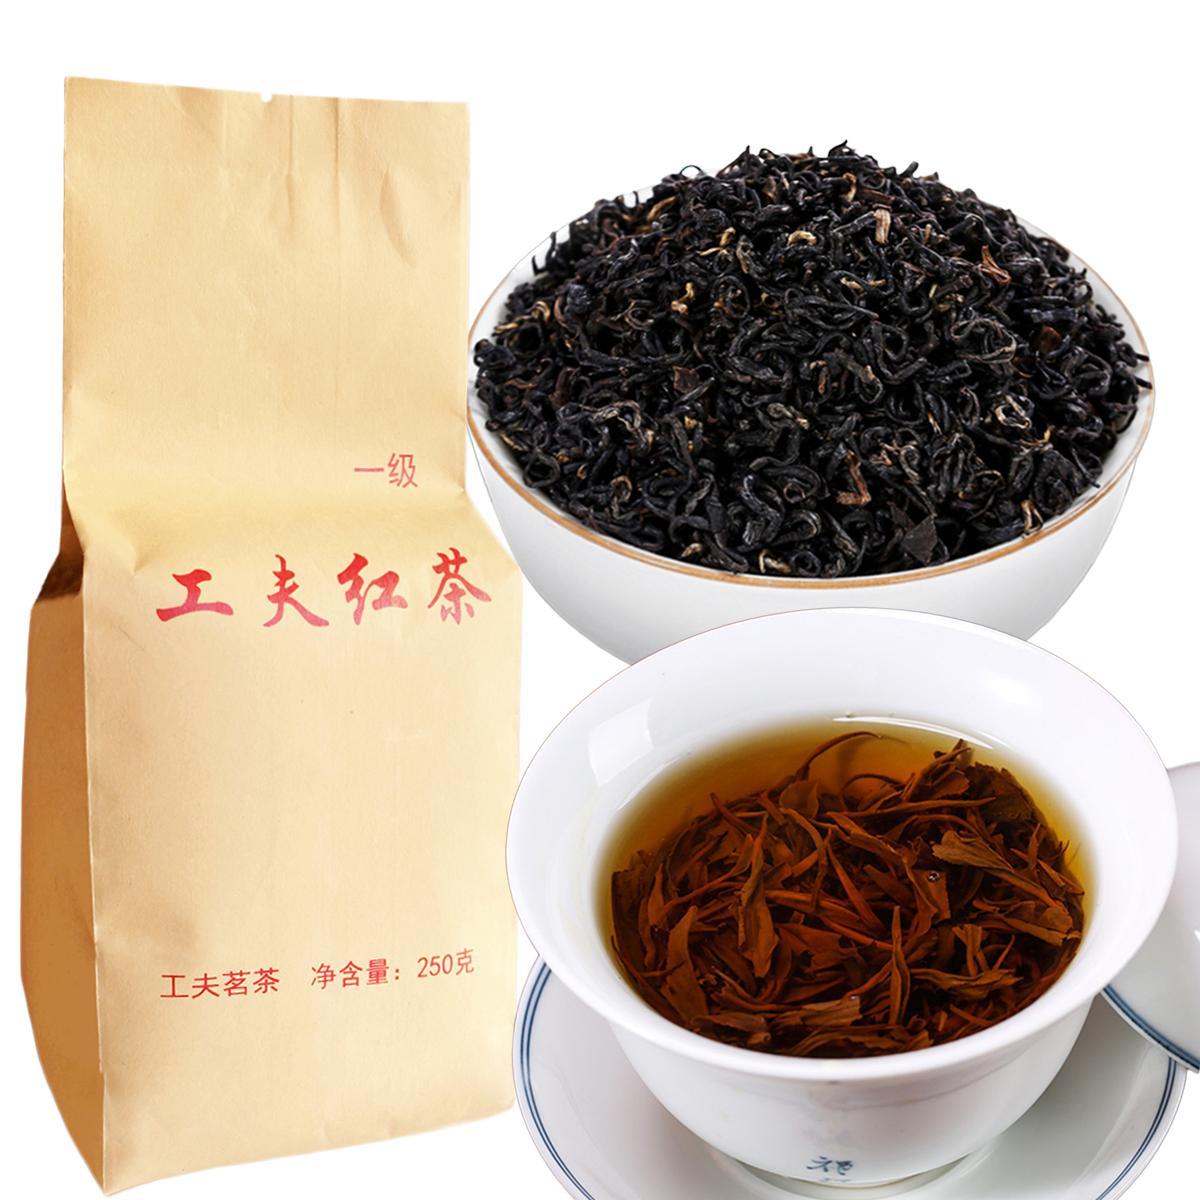 Hot vendas 250g preto orgânico chá chinês Yunnan Dianhong Kungfu Chá Vermelho Health Care New Cozido chá verde Food